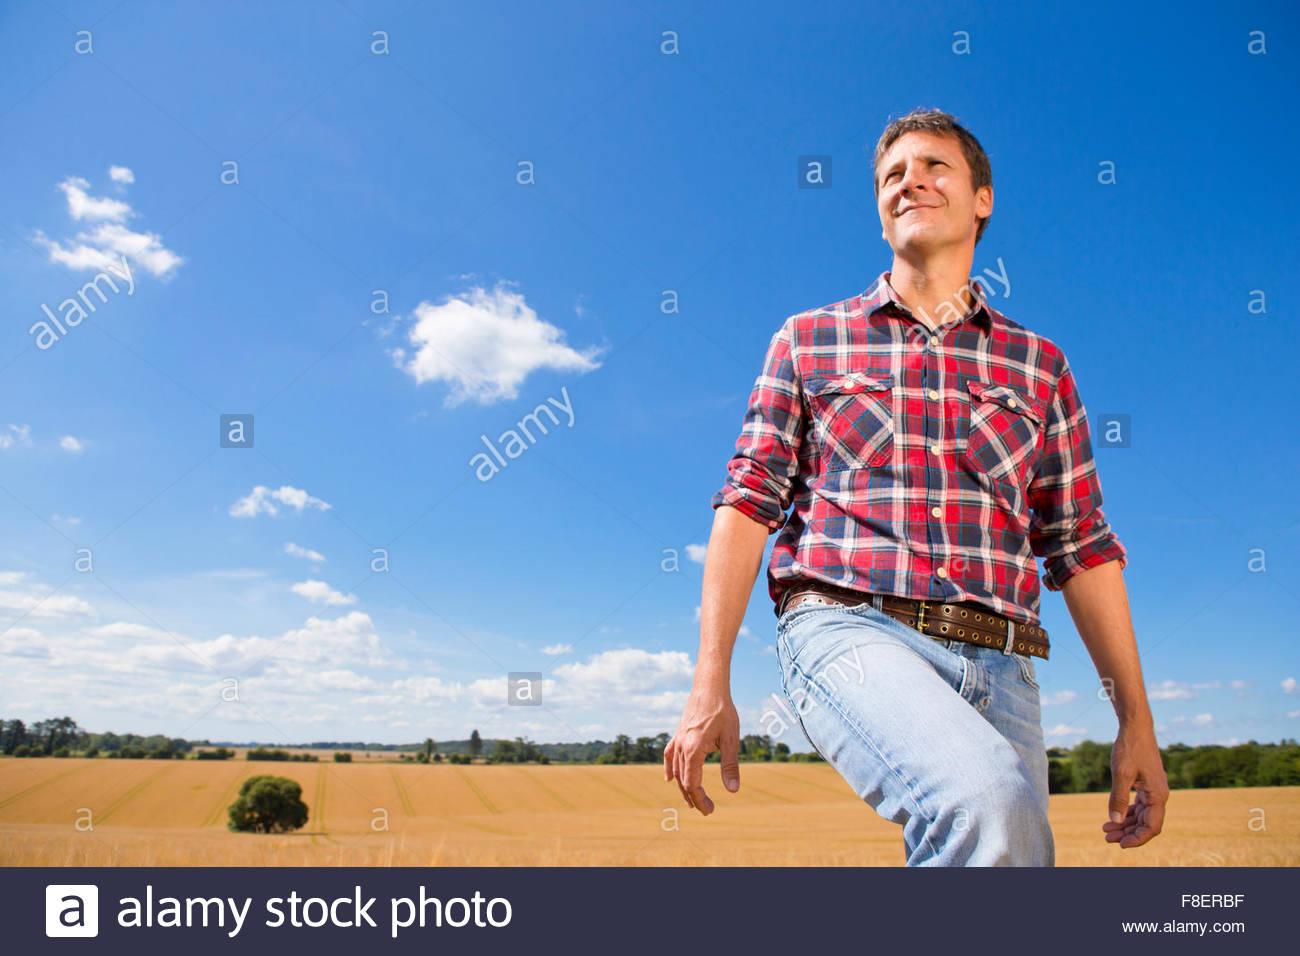 Smiling farmer walking in sunny rural barley crop field in summer - Stock Image